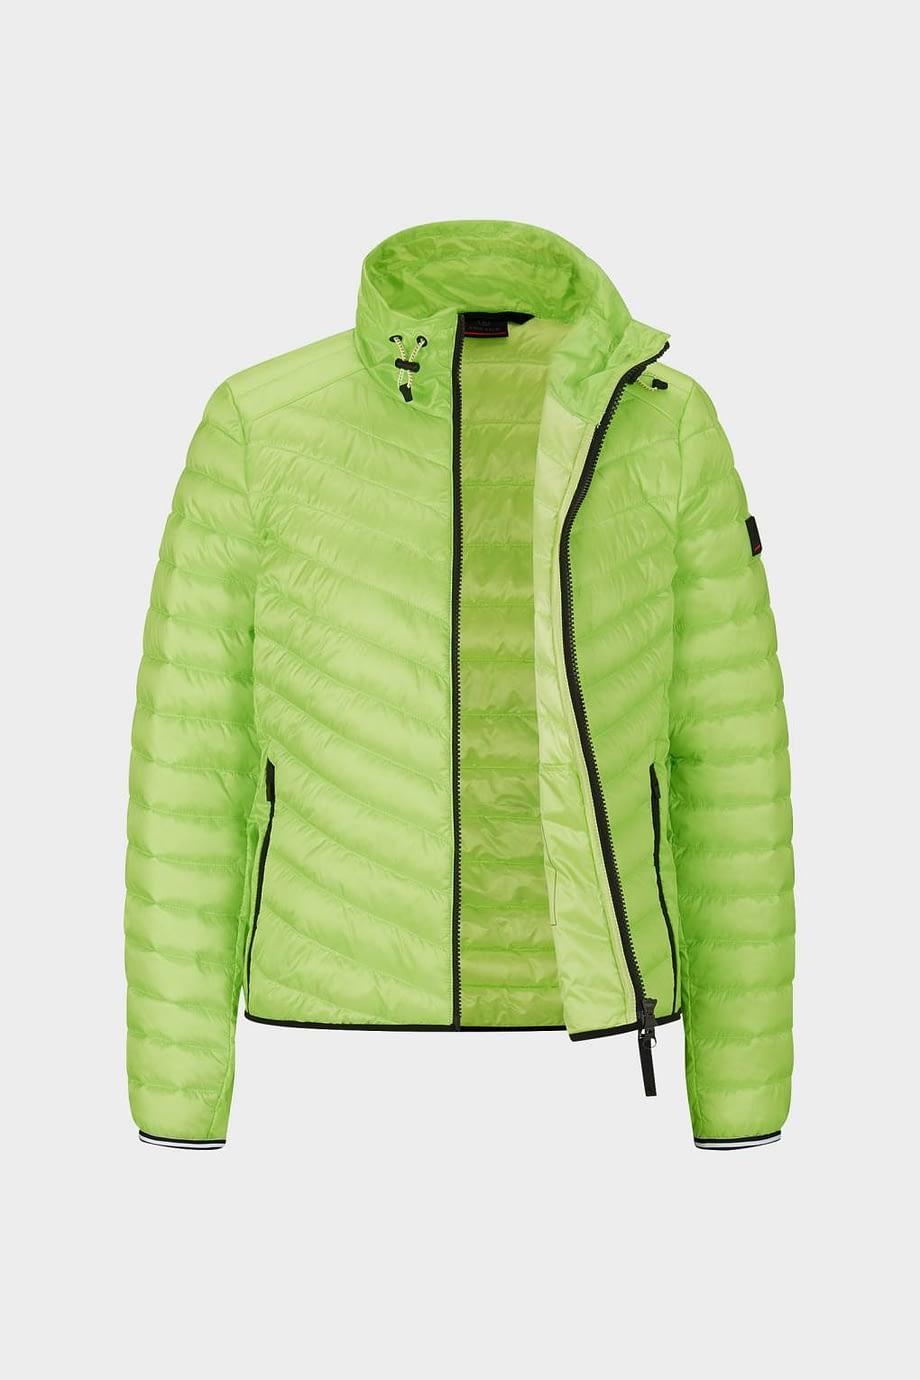 MASHA-QUILTED-JACKET-green5